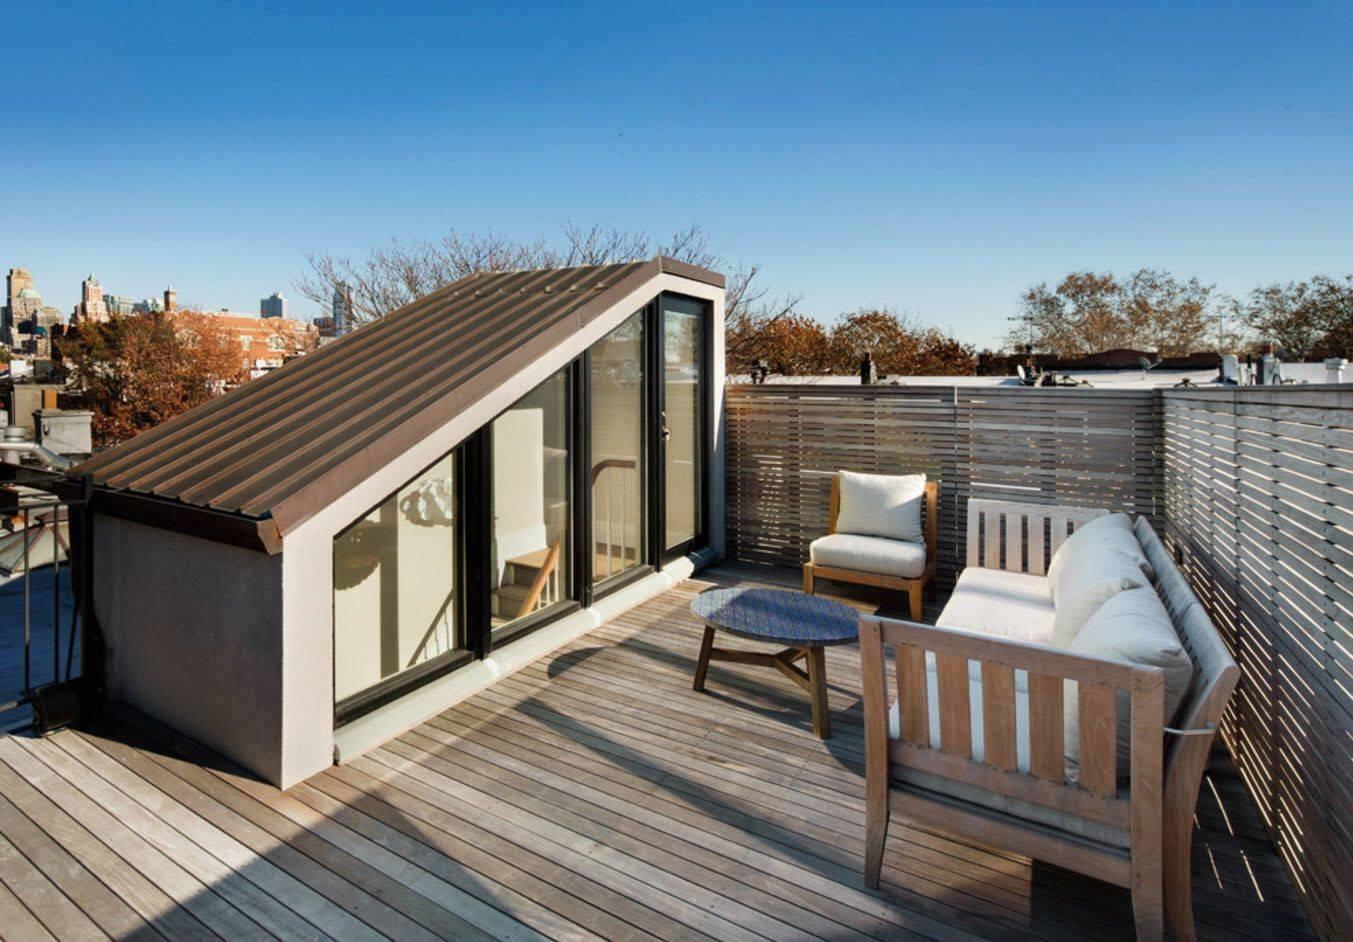 Терраса на крыше дома: технология постройки и советы